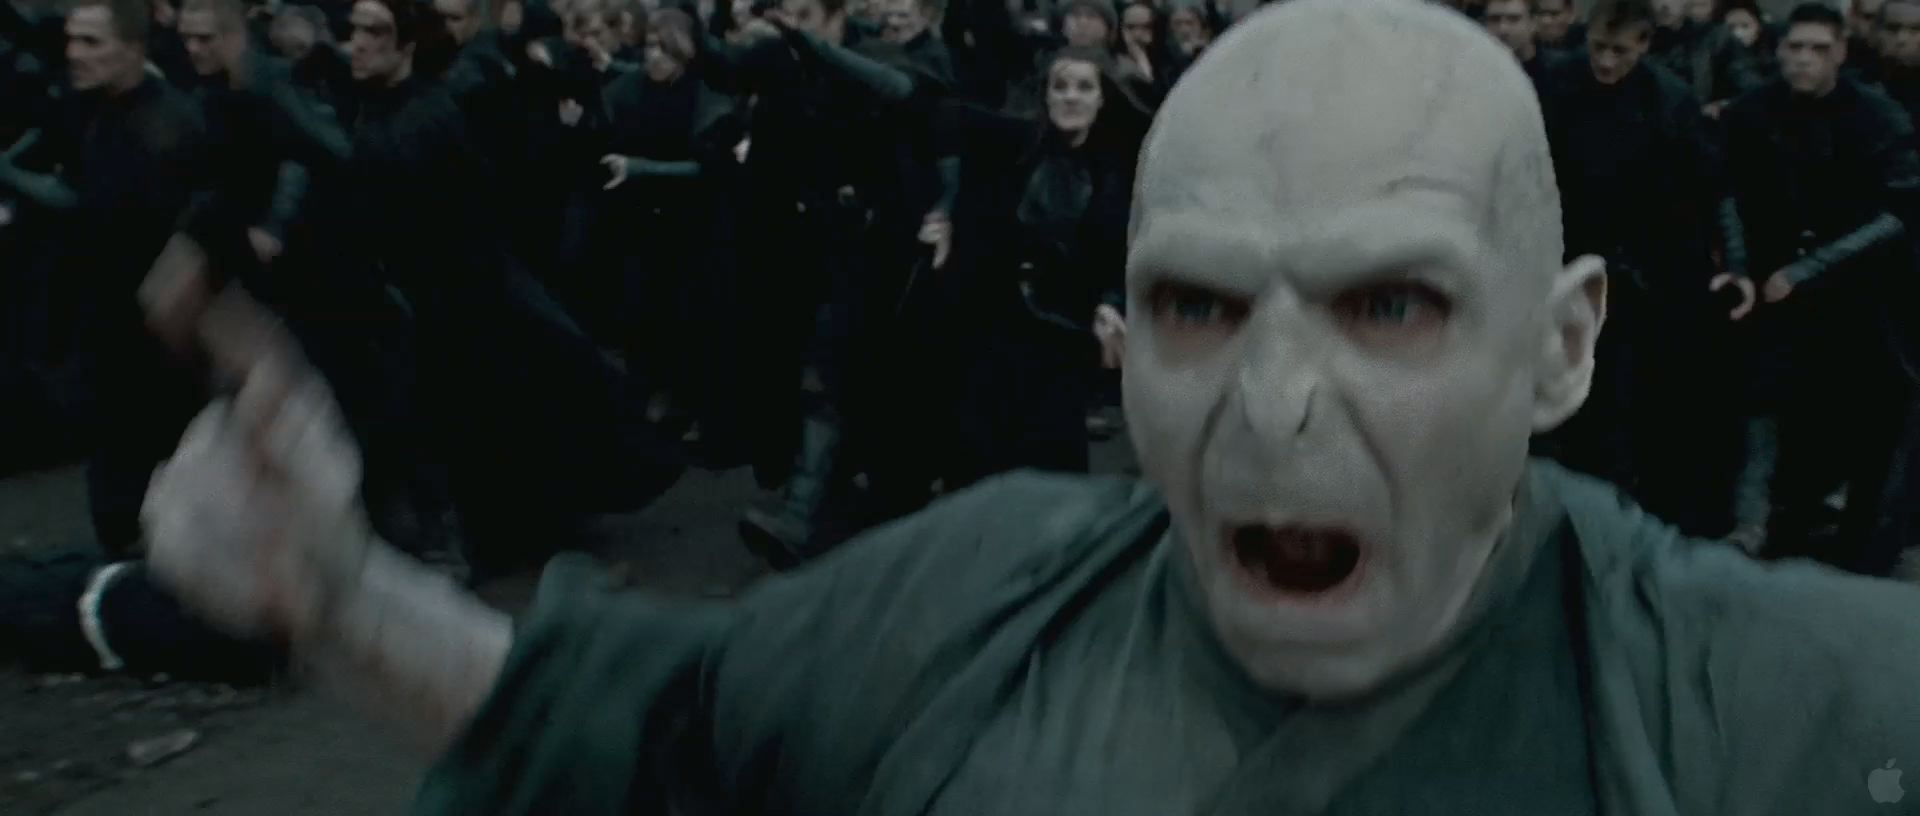 Harry Potter BlogHogwarts HP7 2 Trailer 82